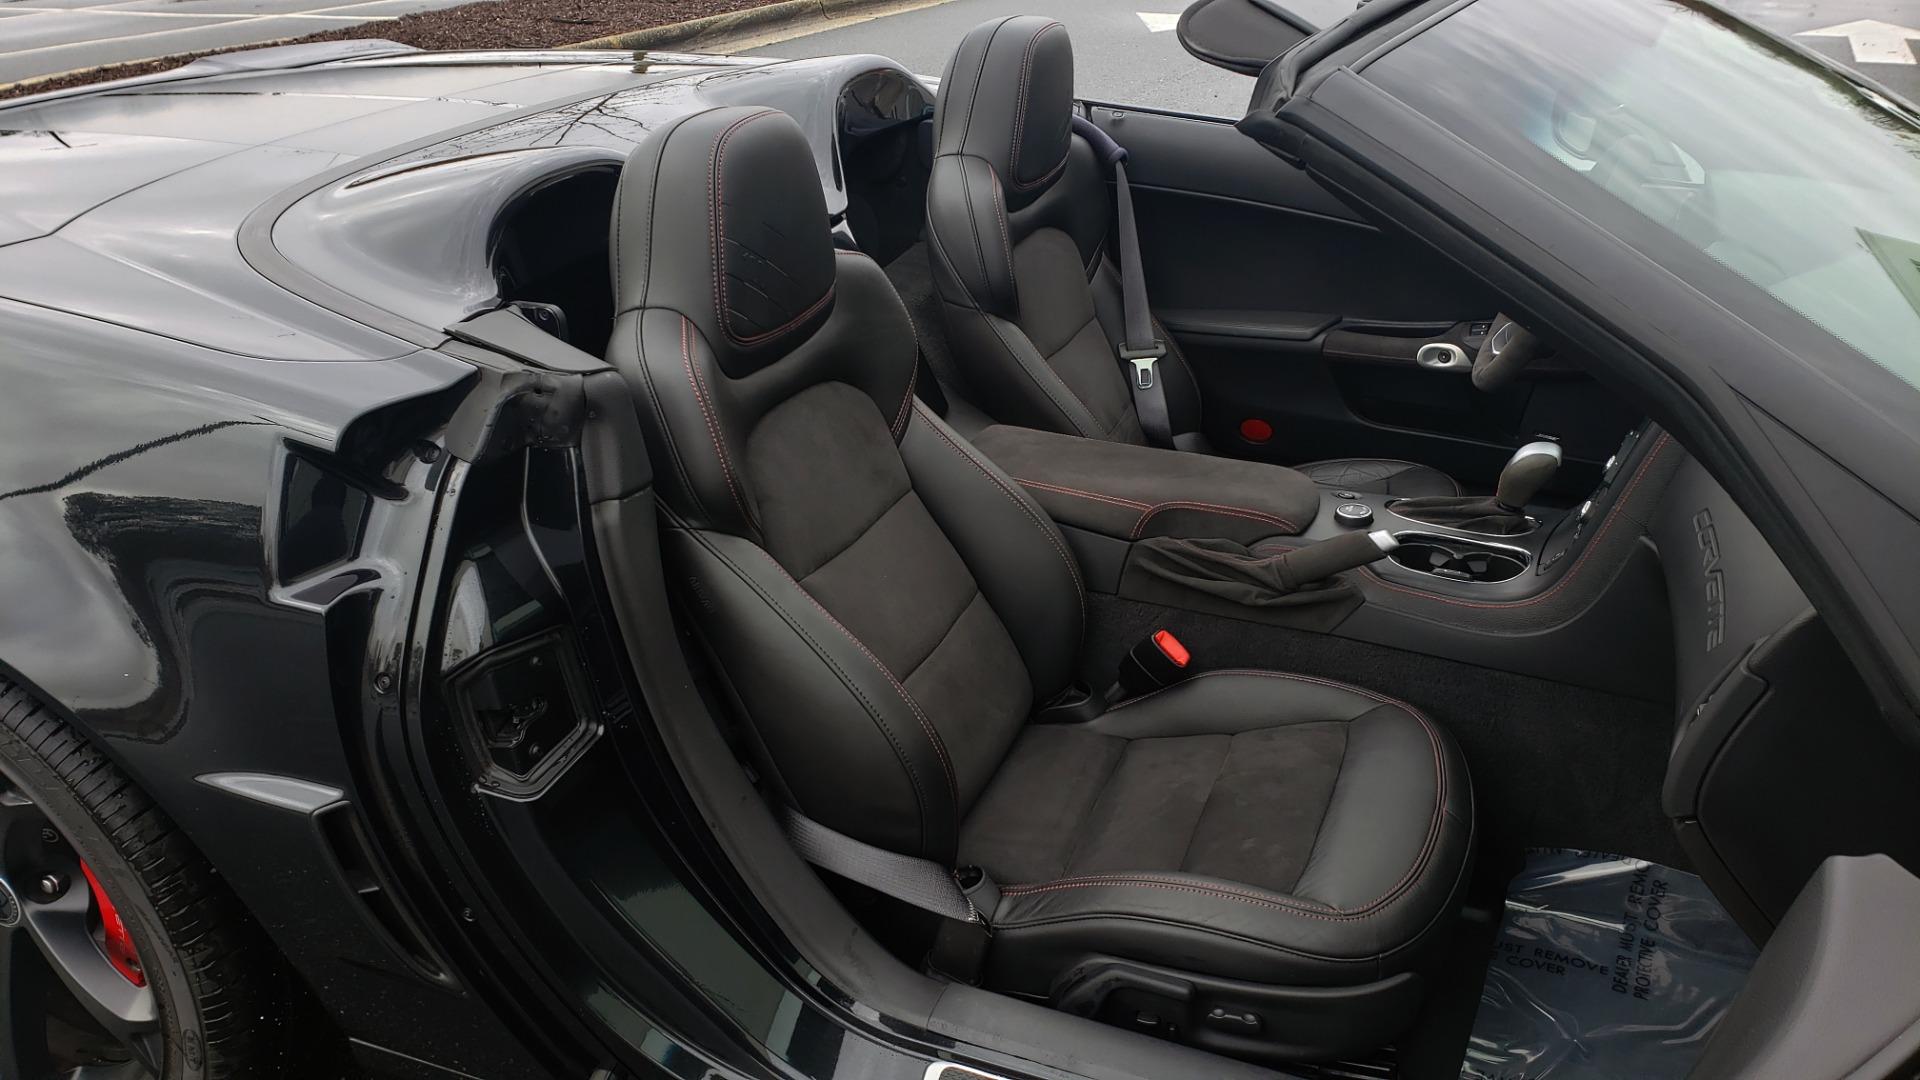 Used 2012 Chevrolet CORVETTE Z16 GRAND SPORT 3LT CONVERTIBLE / 6-SPD AUTO / NAV for sale $38,990 at Formula Imports in Charlotte NC 28227 63